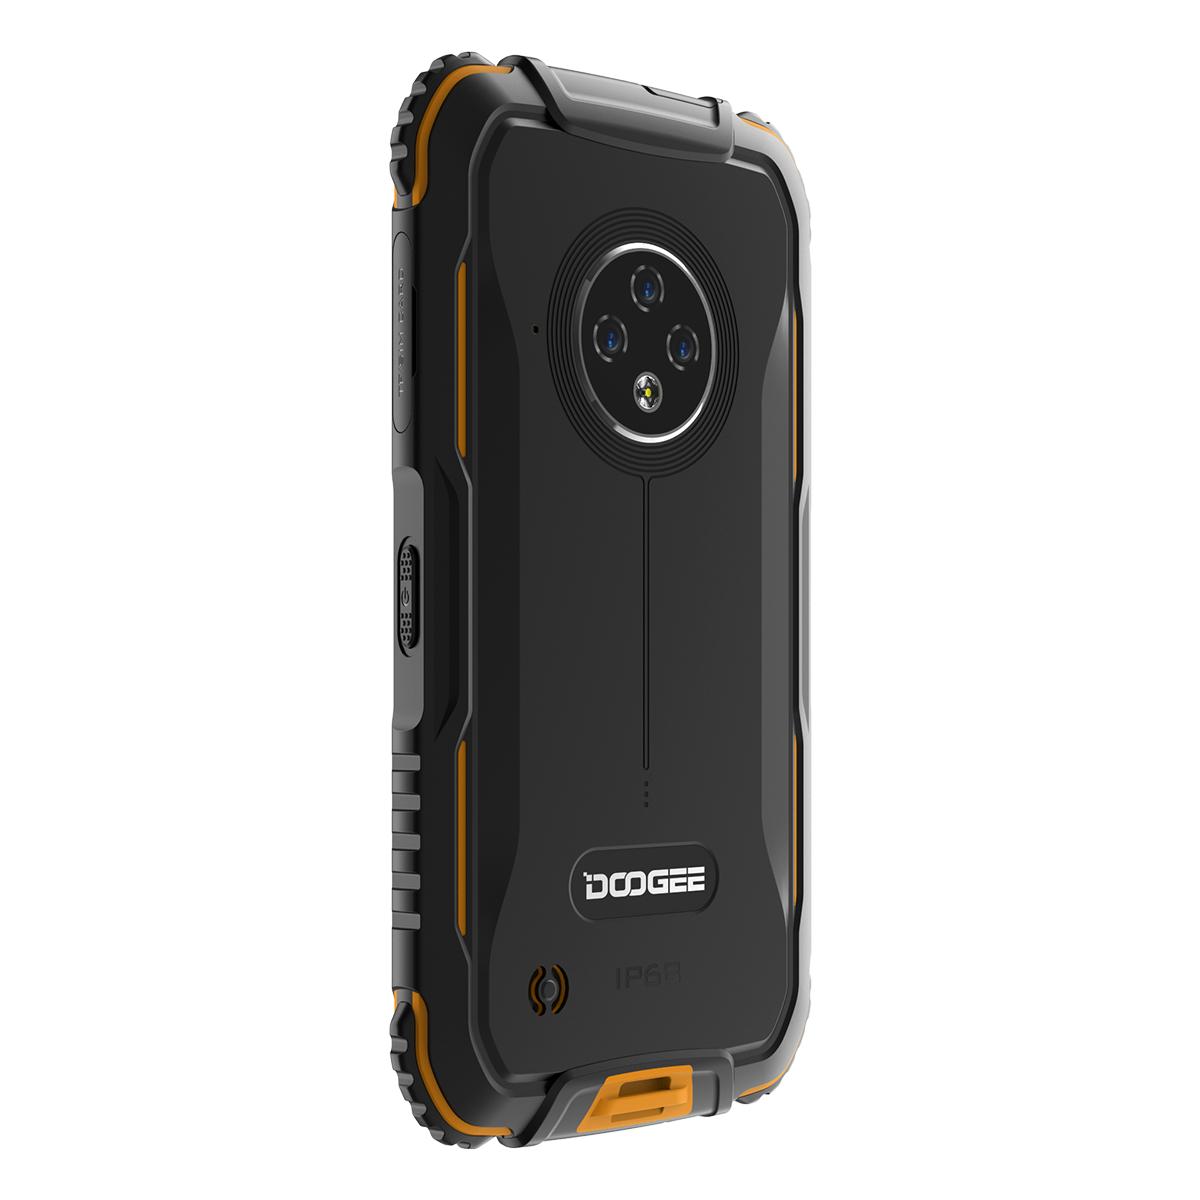 Doogee S35 2GB/16GB Fire Orange